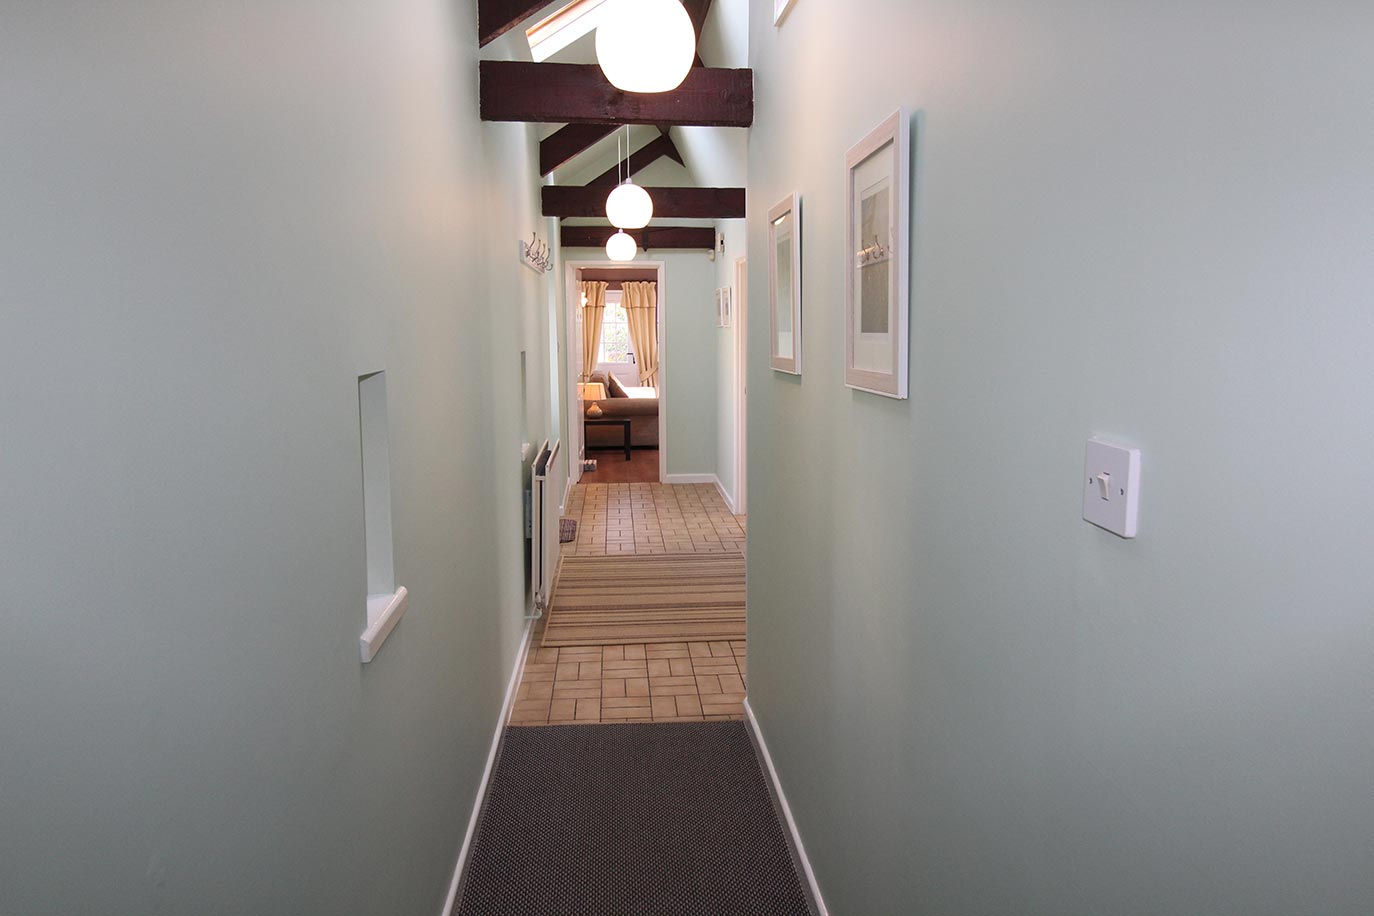 5-Pele---Hallway-1-copy